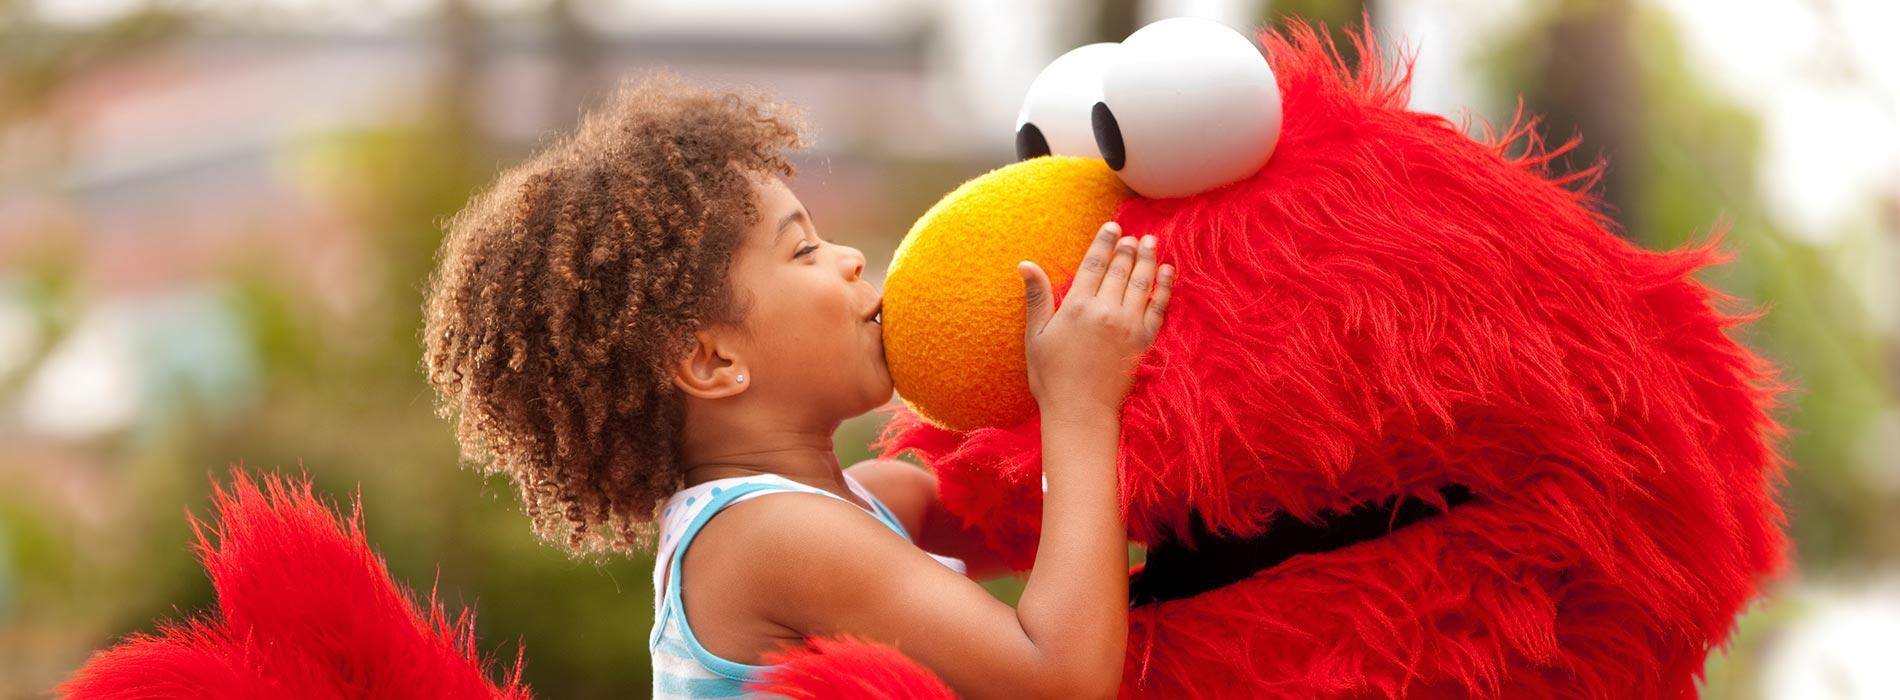 Meet Elmo at Sesame Place San Diego